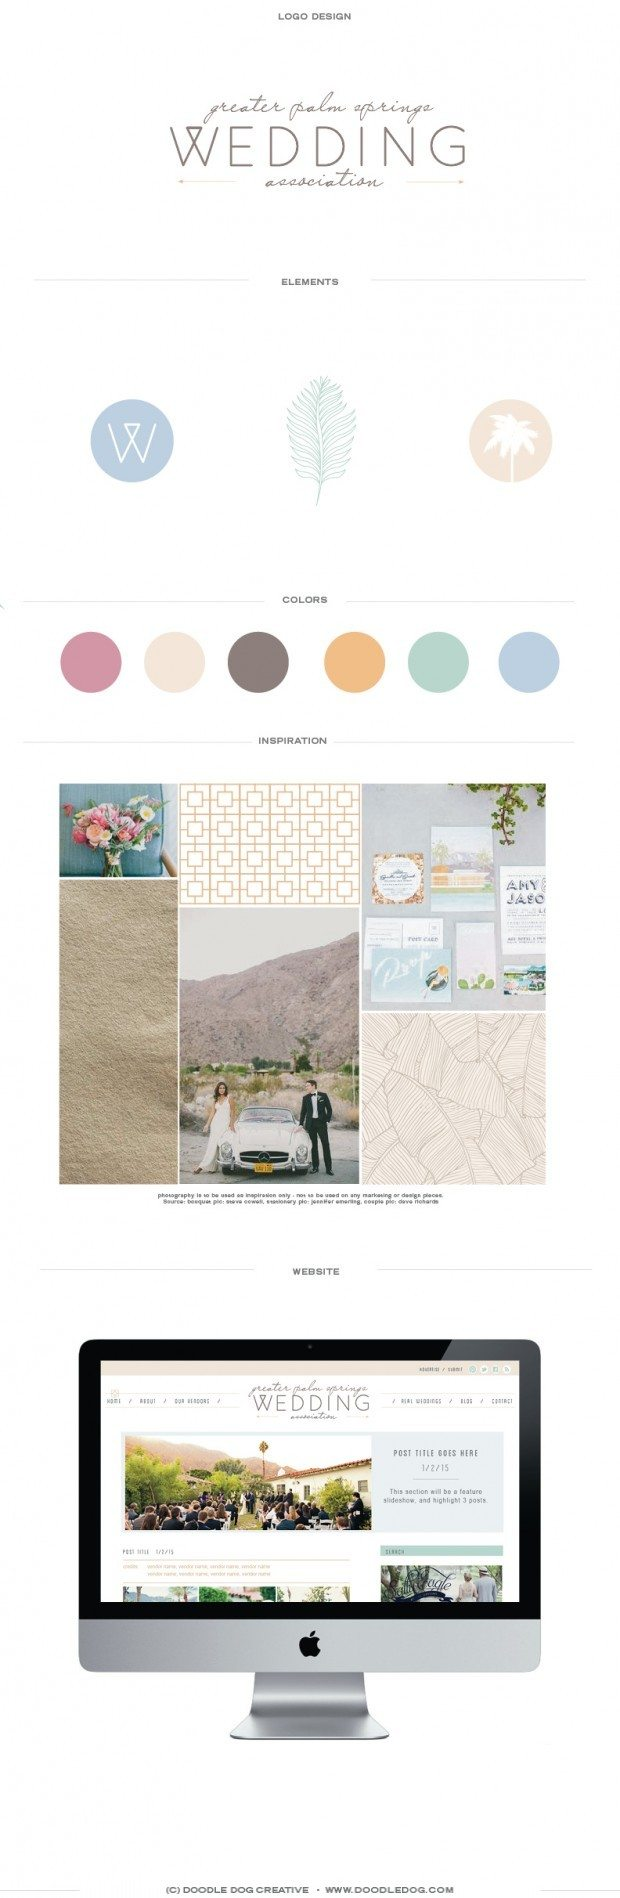 branding, webdesign, wedding industry, wedding association, doodle dog